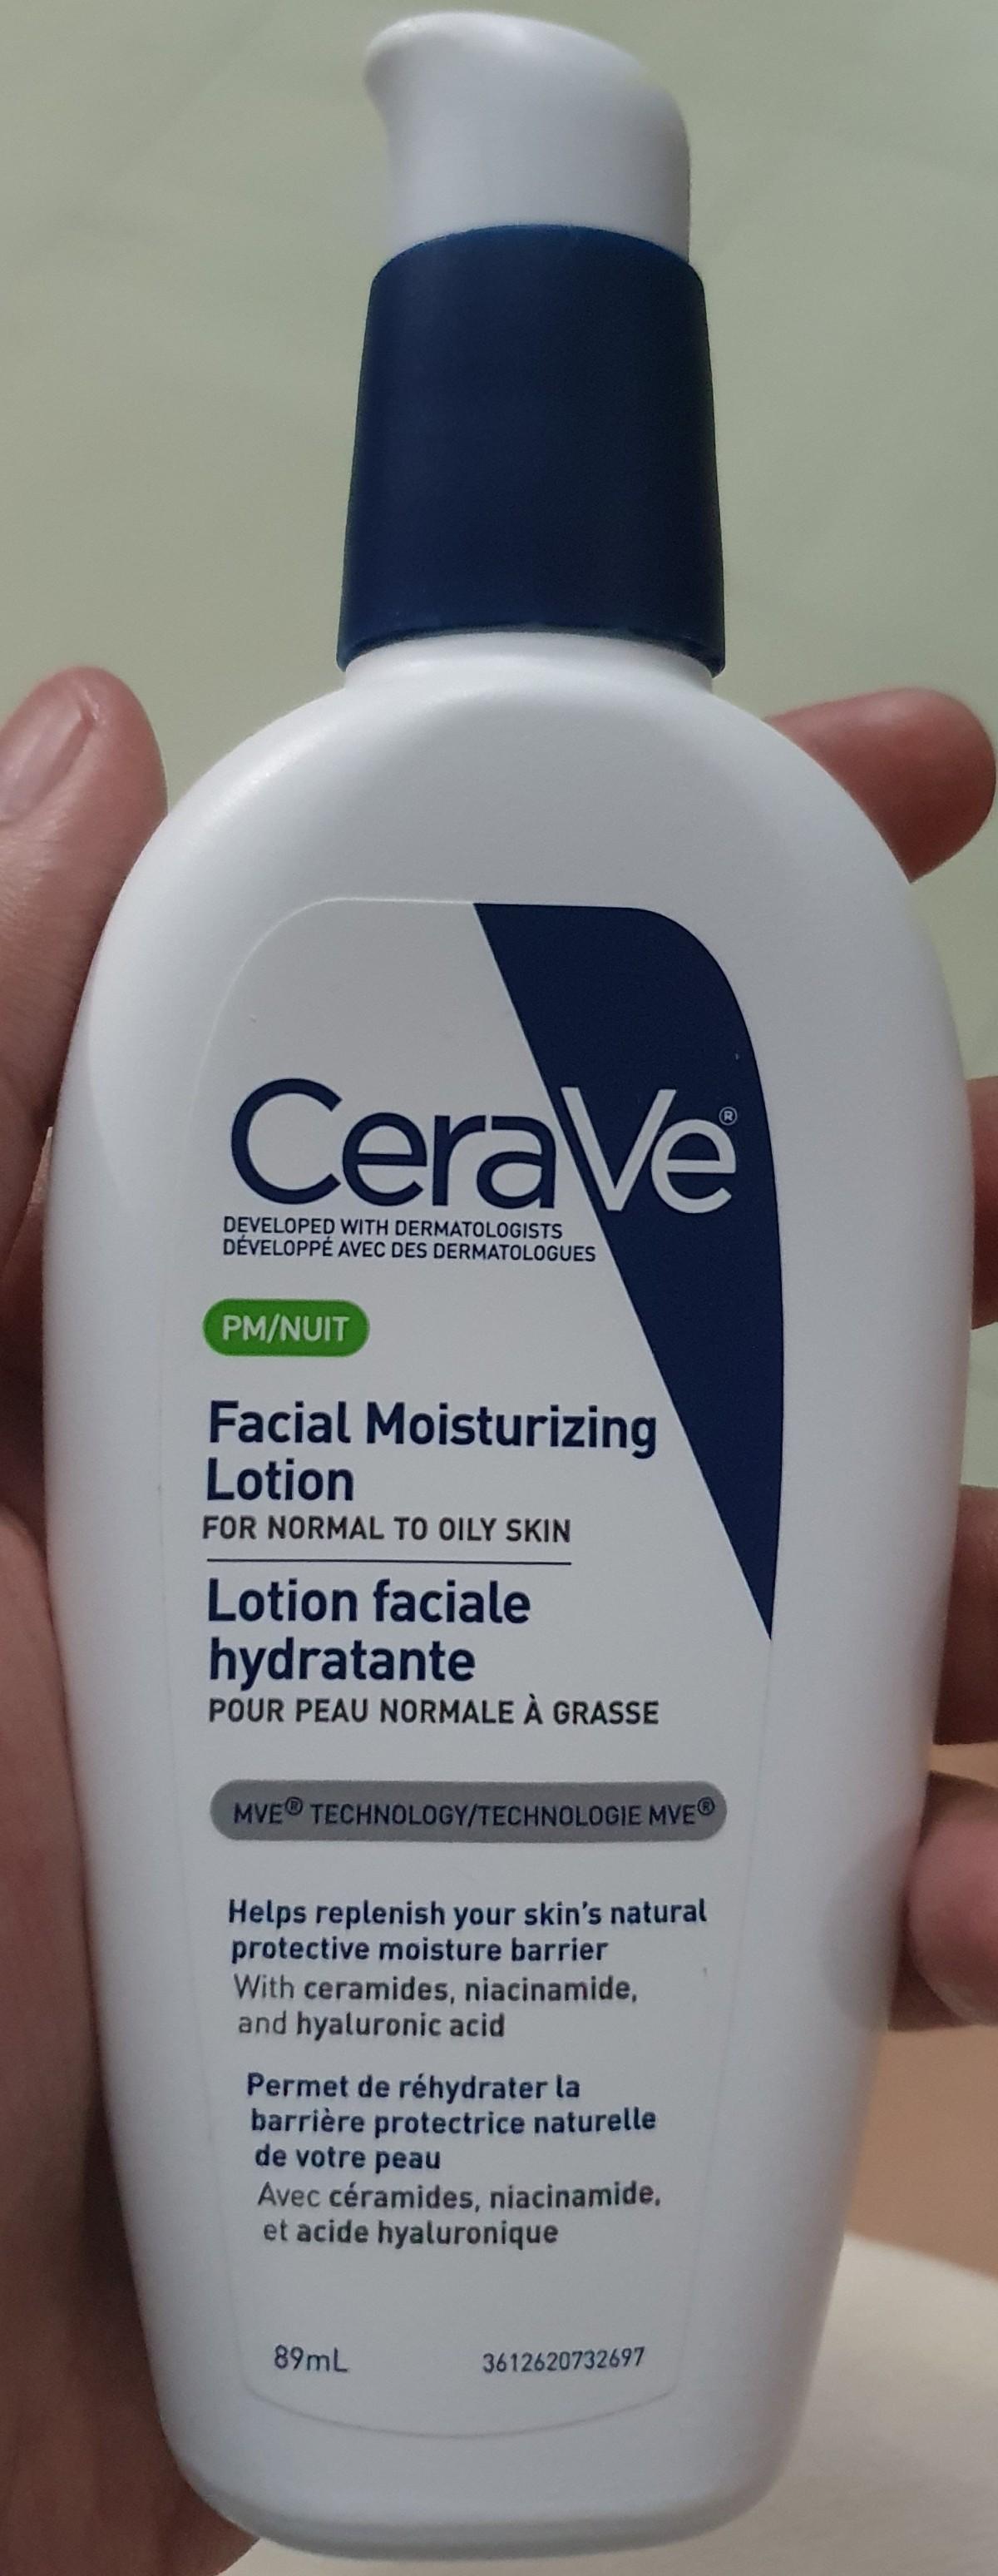 Cerave Facial Moisturizing Lotion(PM)